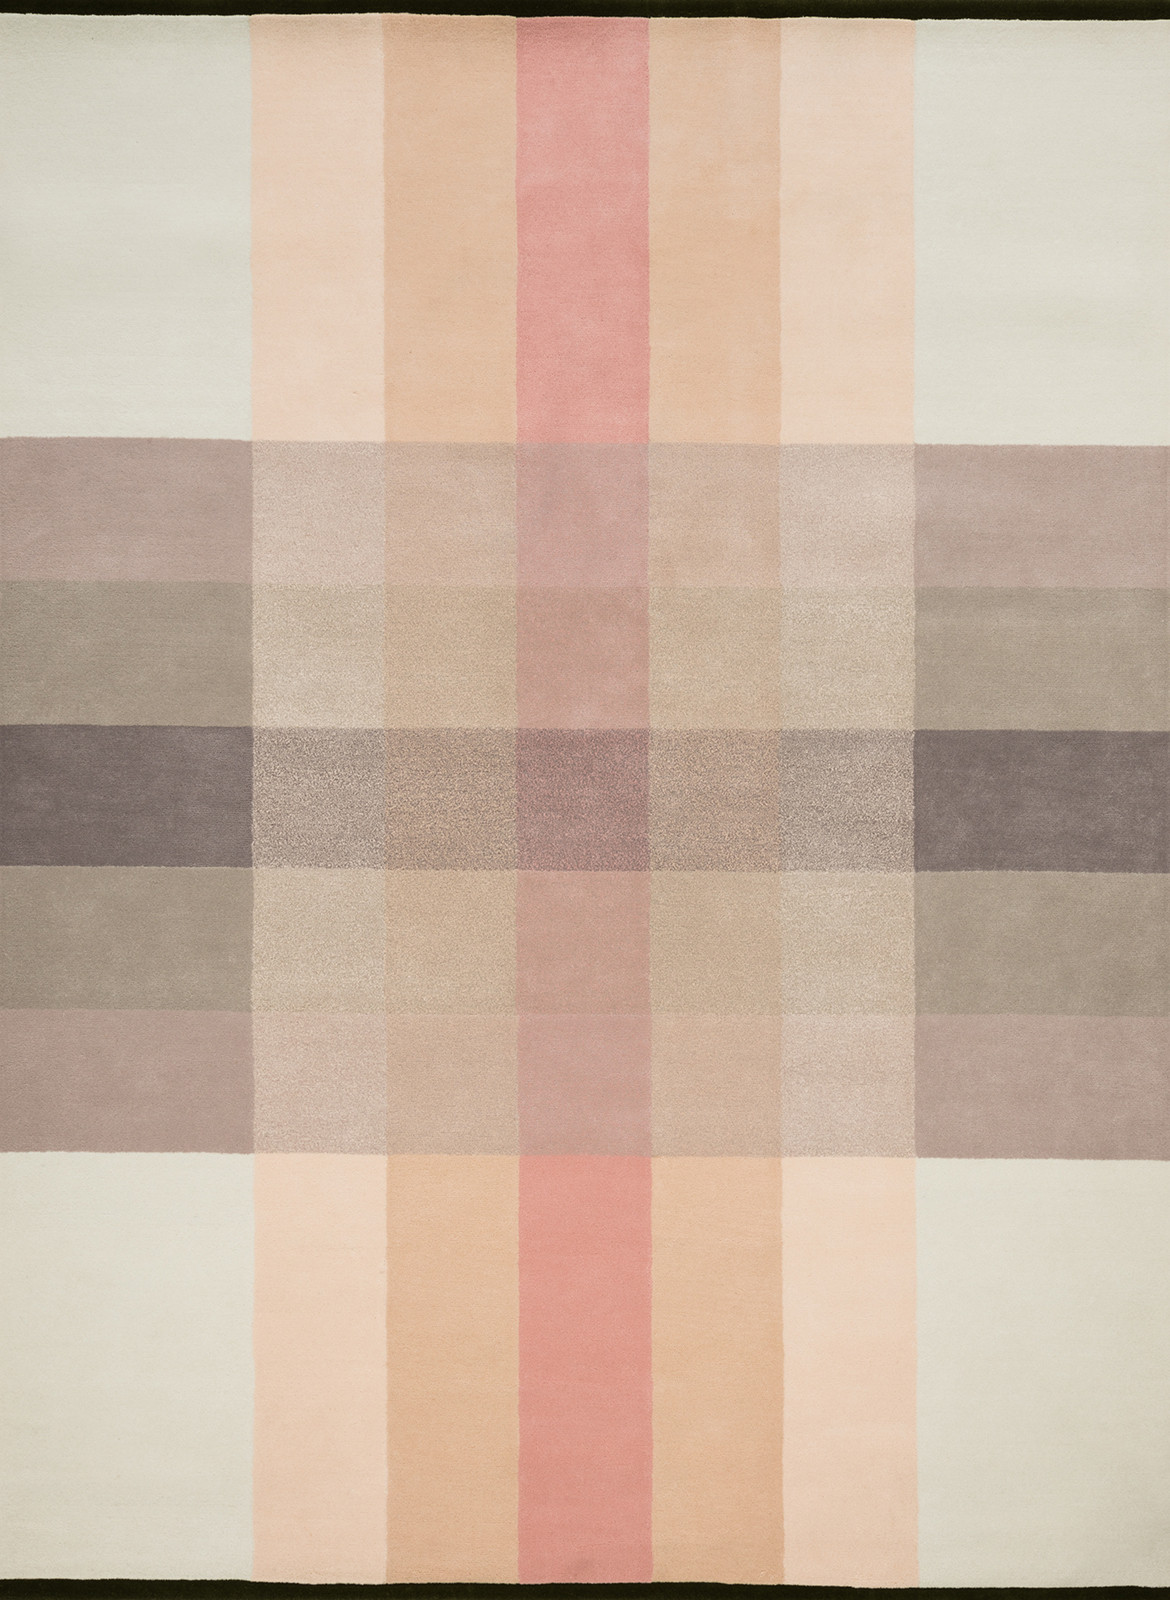 Designer Rugs Bernabeifreeman CC Richard Whitman crossing colours